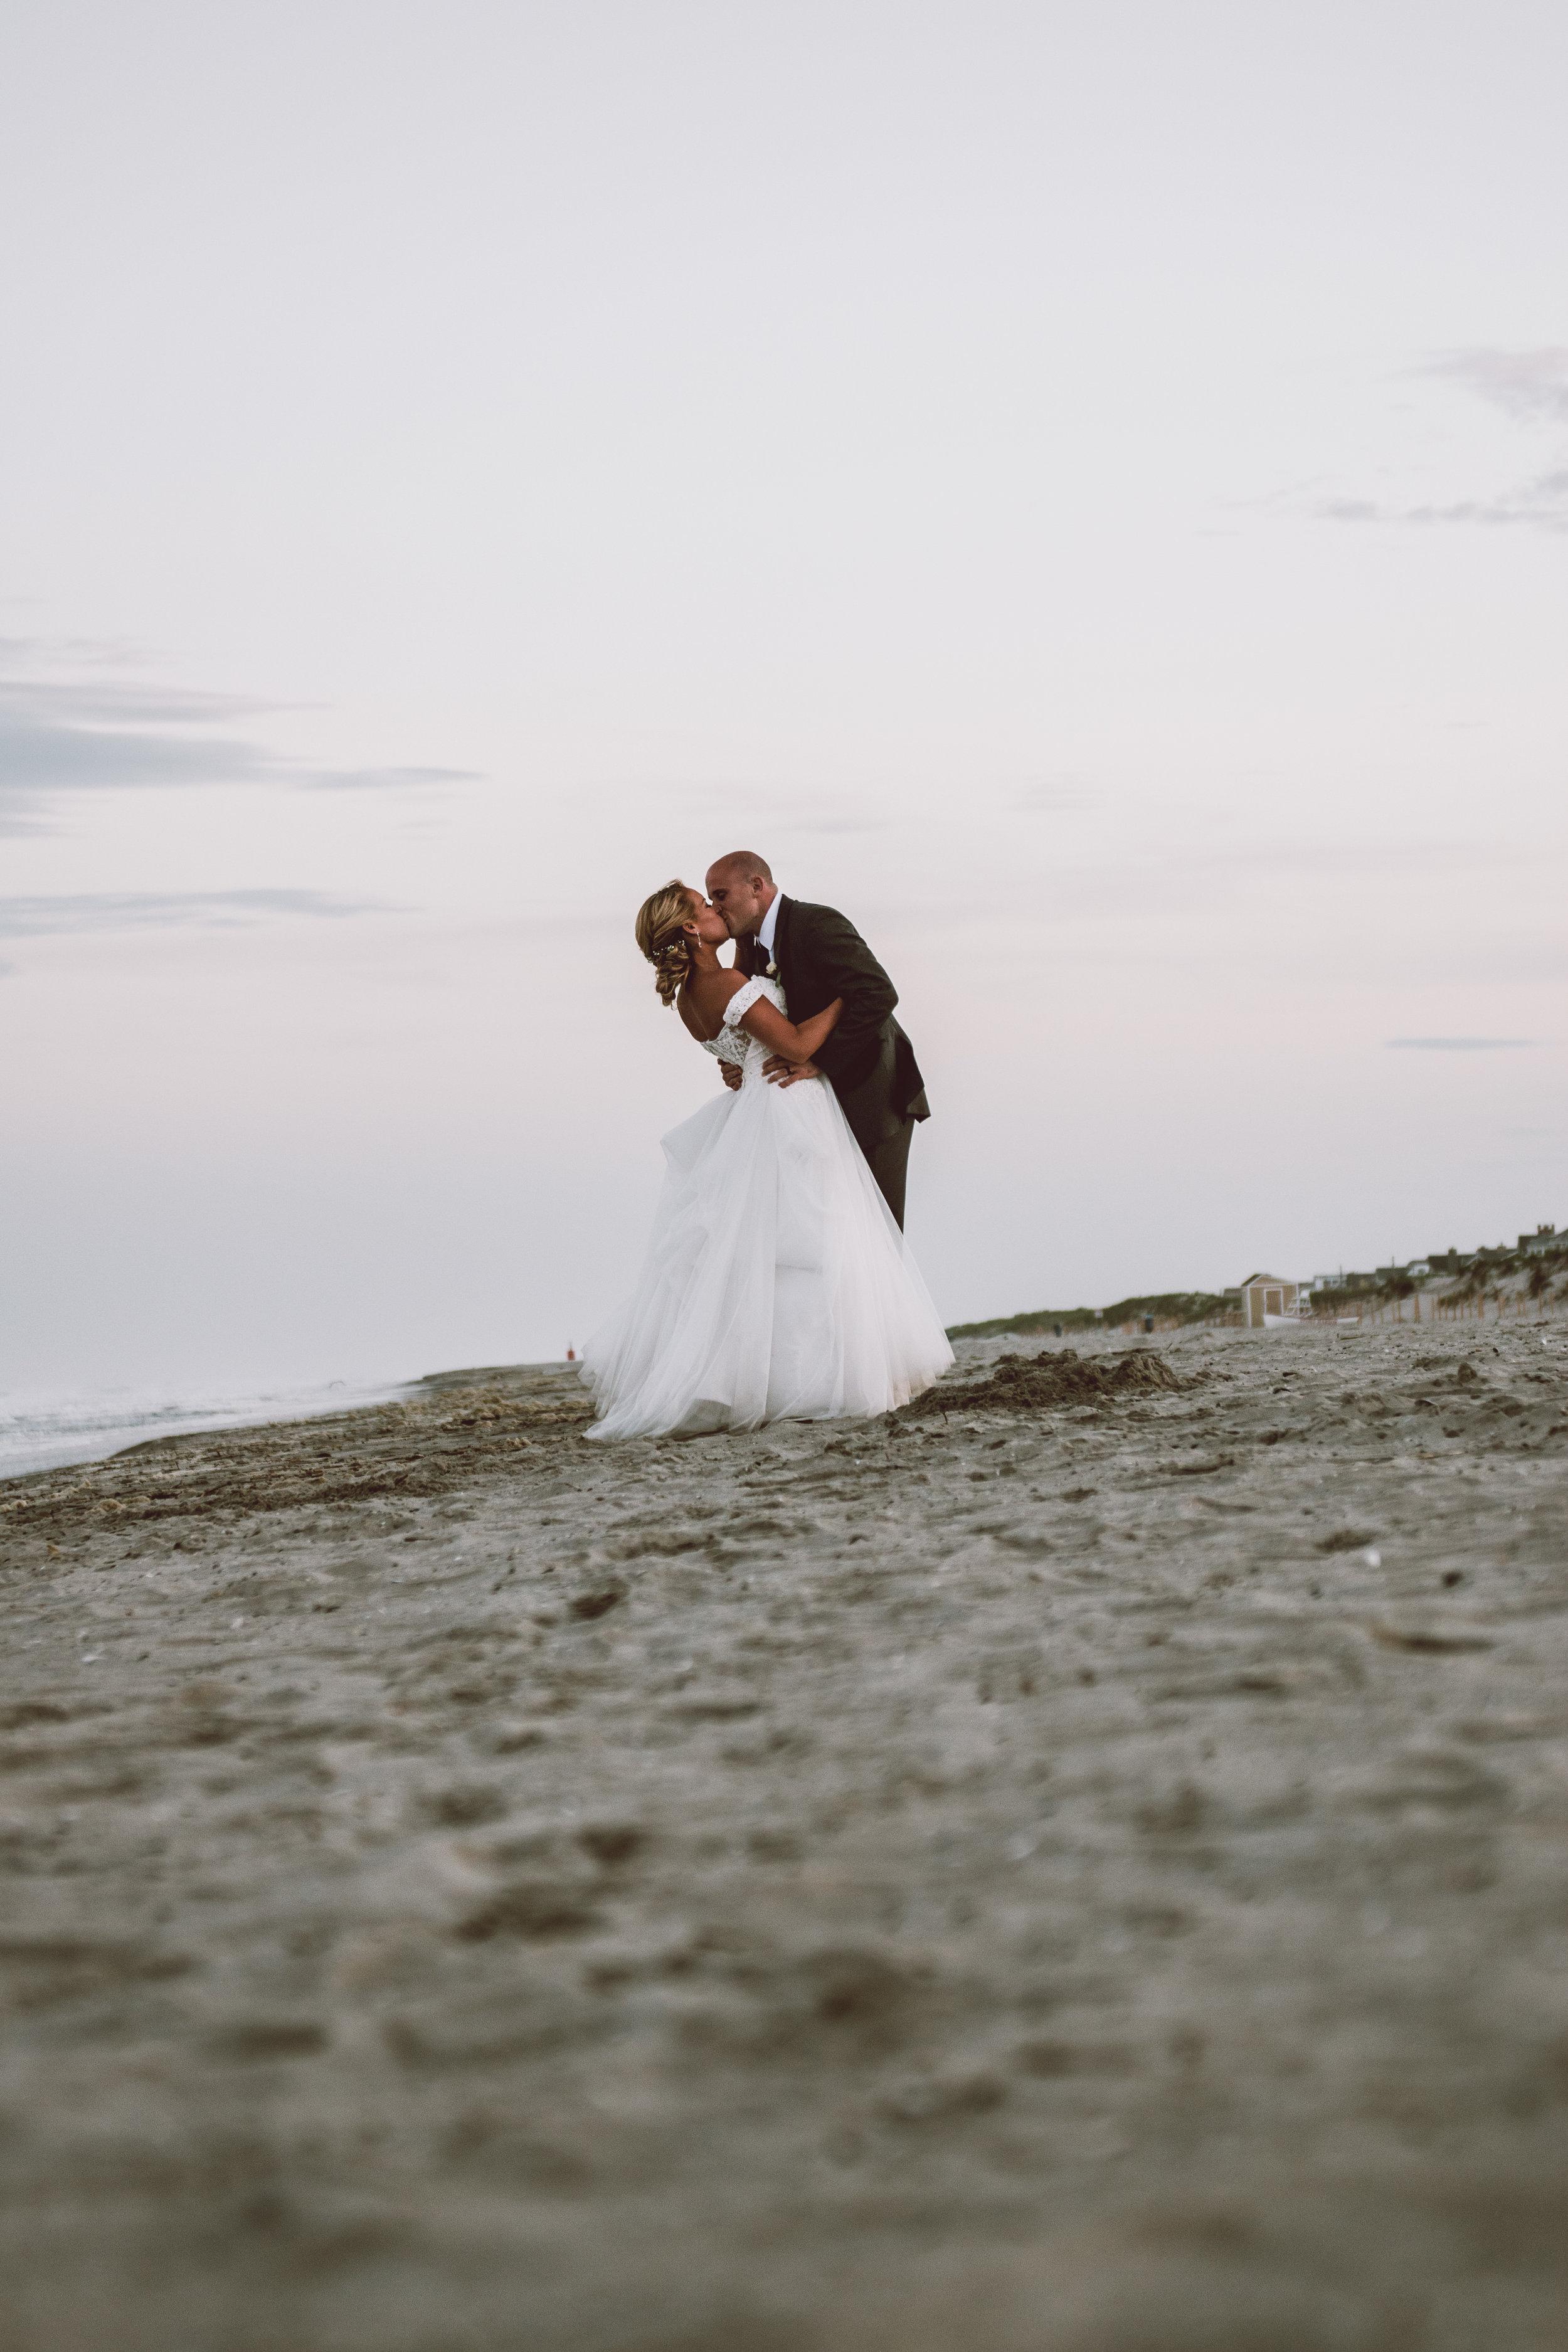 ICONA GOLDEN INN AVALON NJ WEDDING PHOTOGRAPHY  - 079.jpg